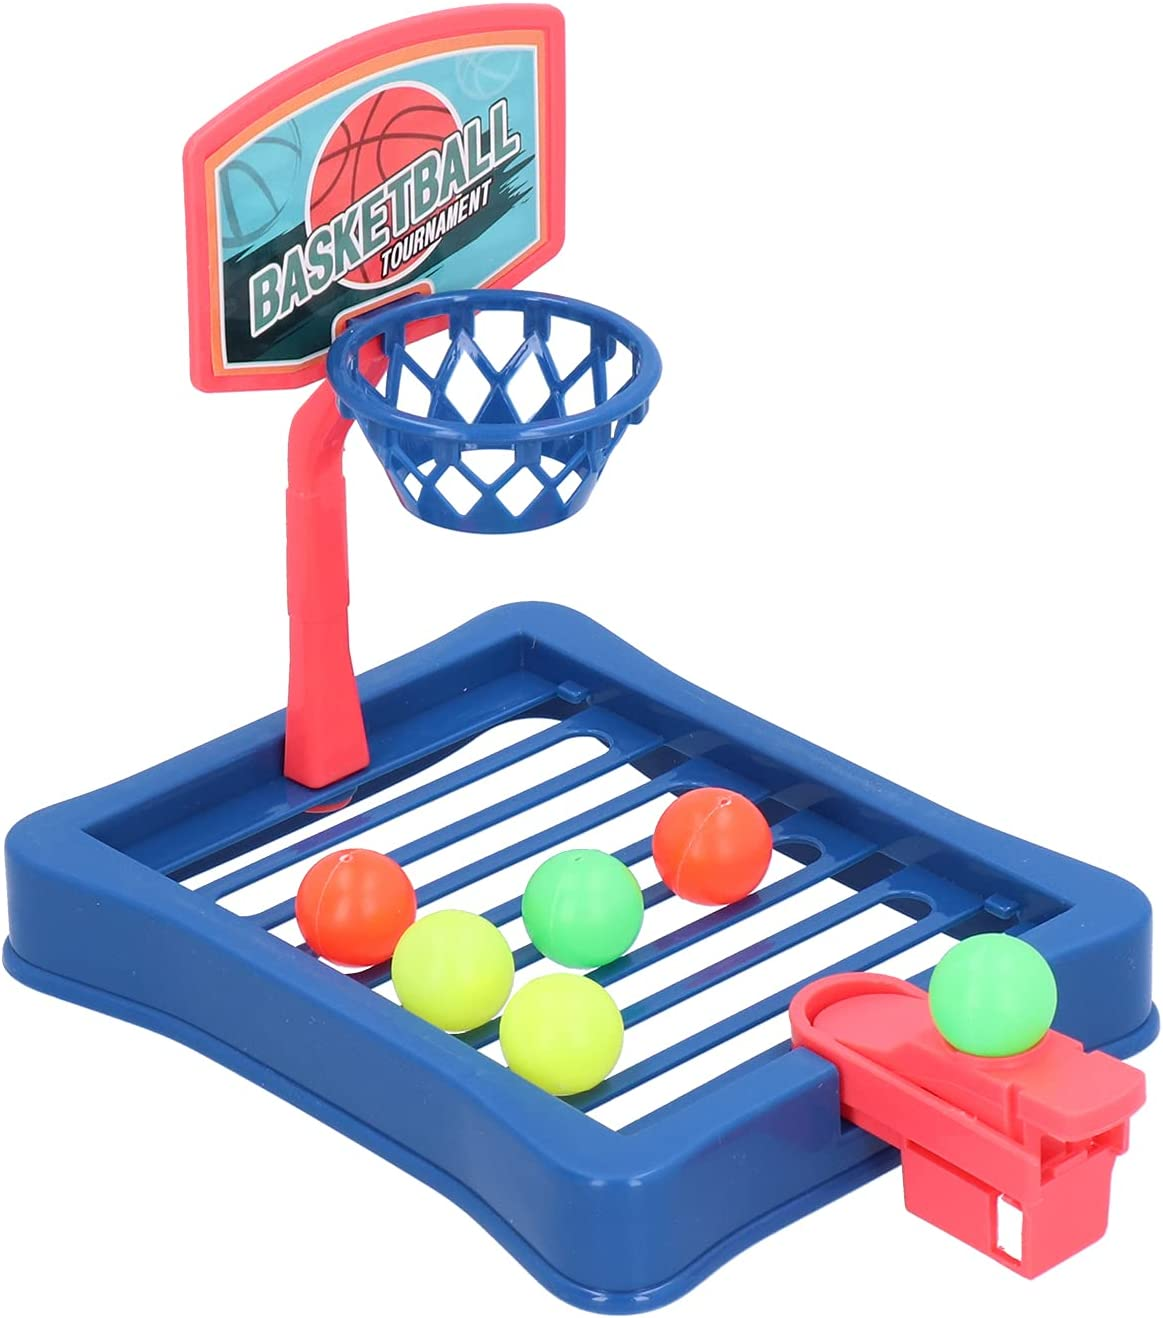 GLOGLOW Desktop Basketball Game, Basket Ball Shootout Table Top